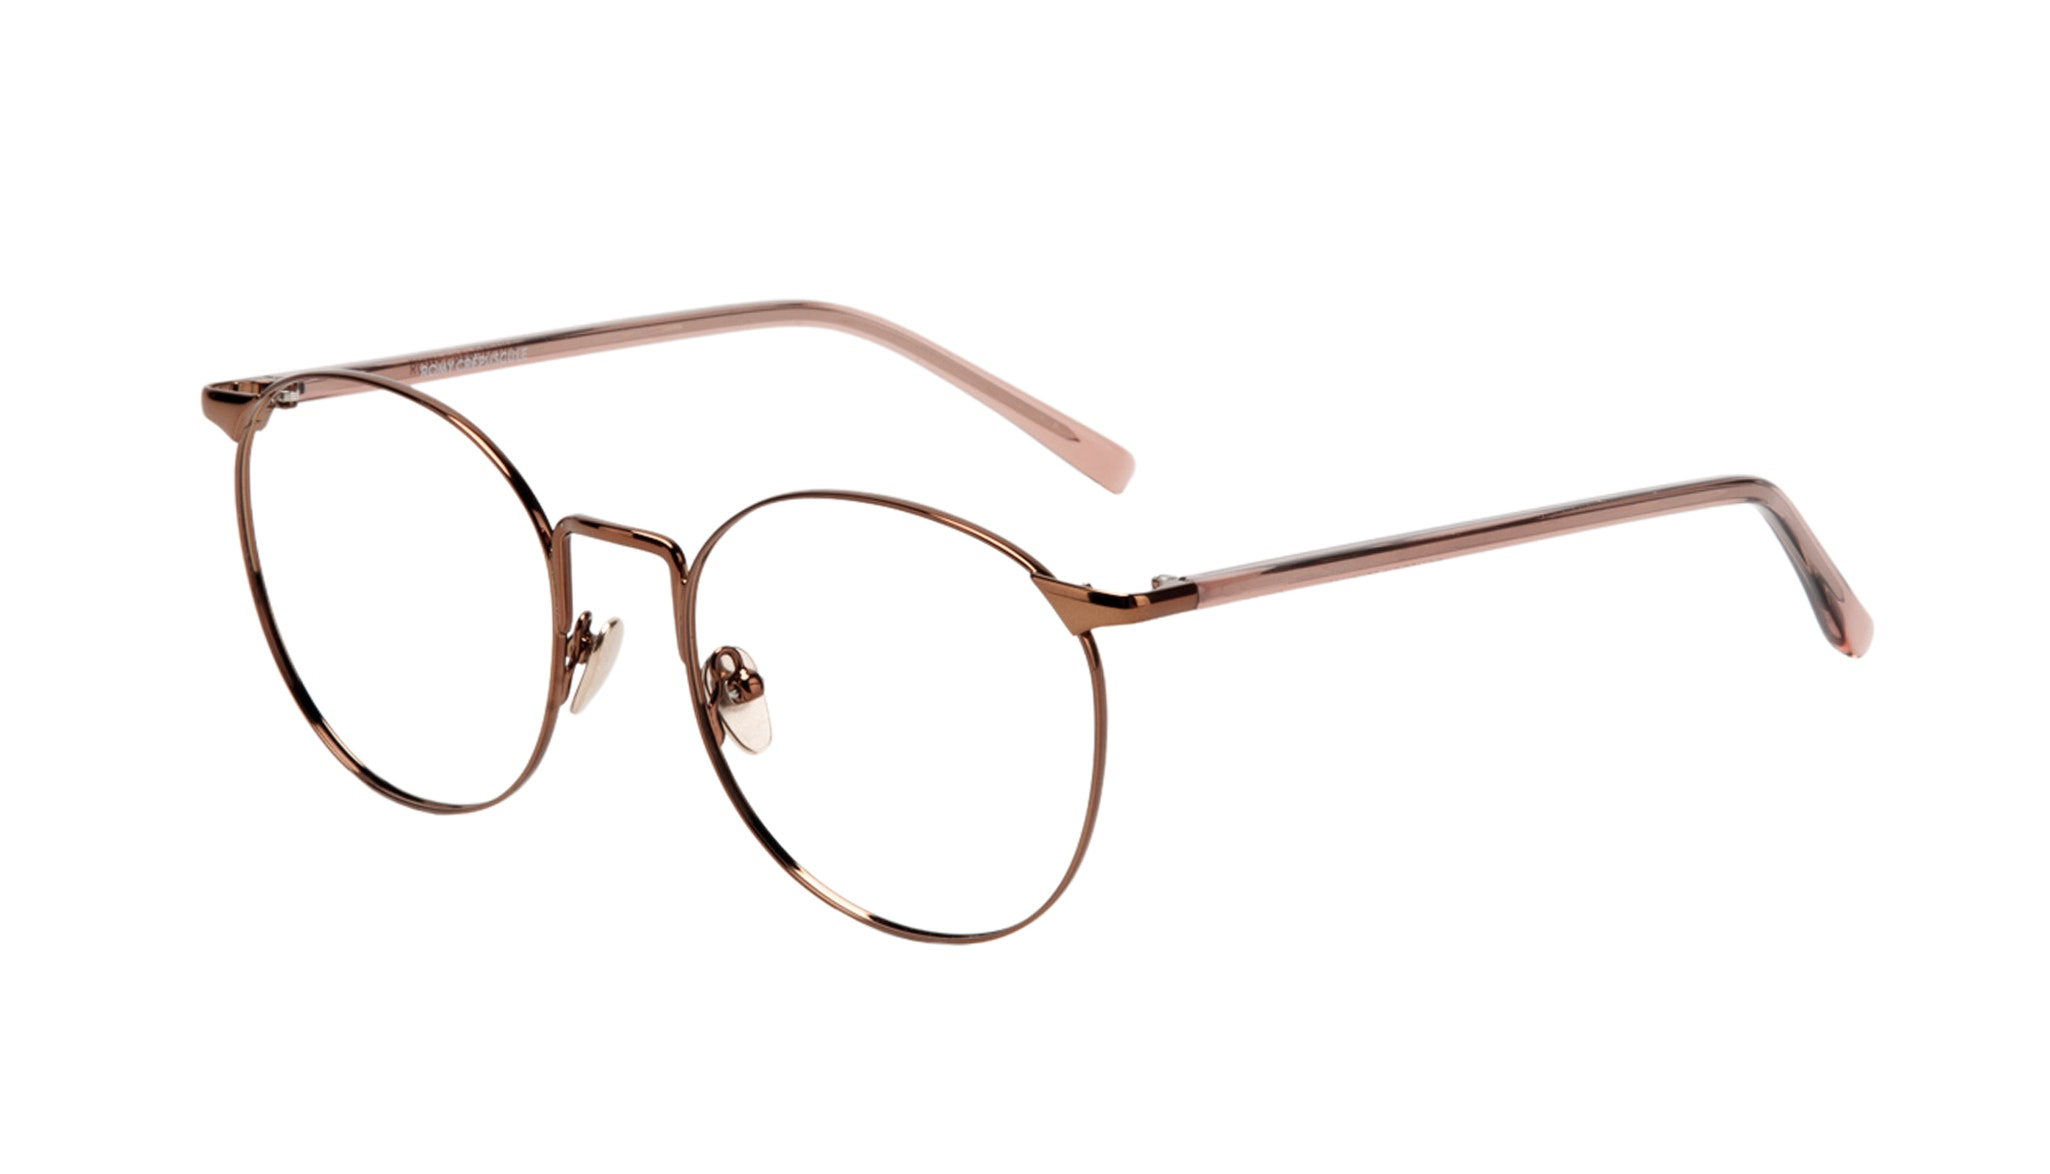 Affordable Fashion Glasses Round Eyeglasses Women Romy Crepuscule Tilt